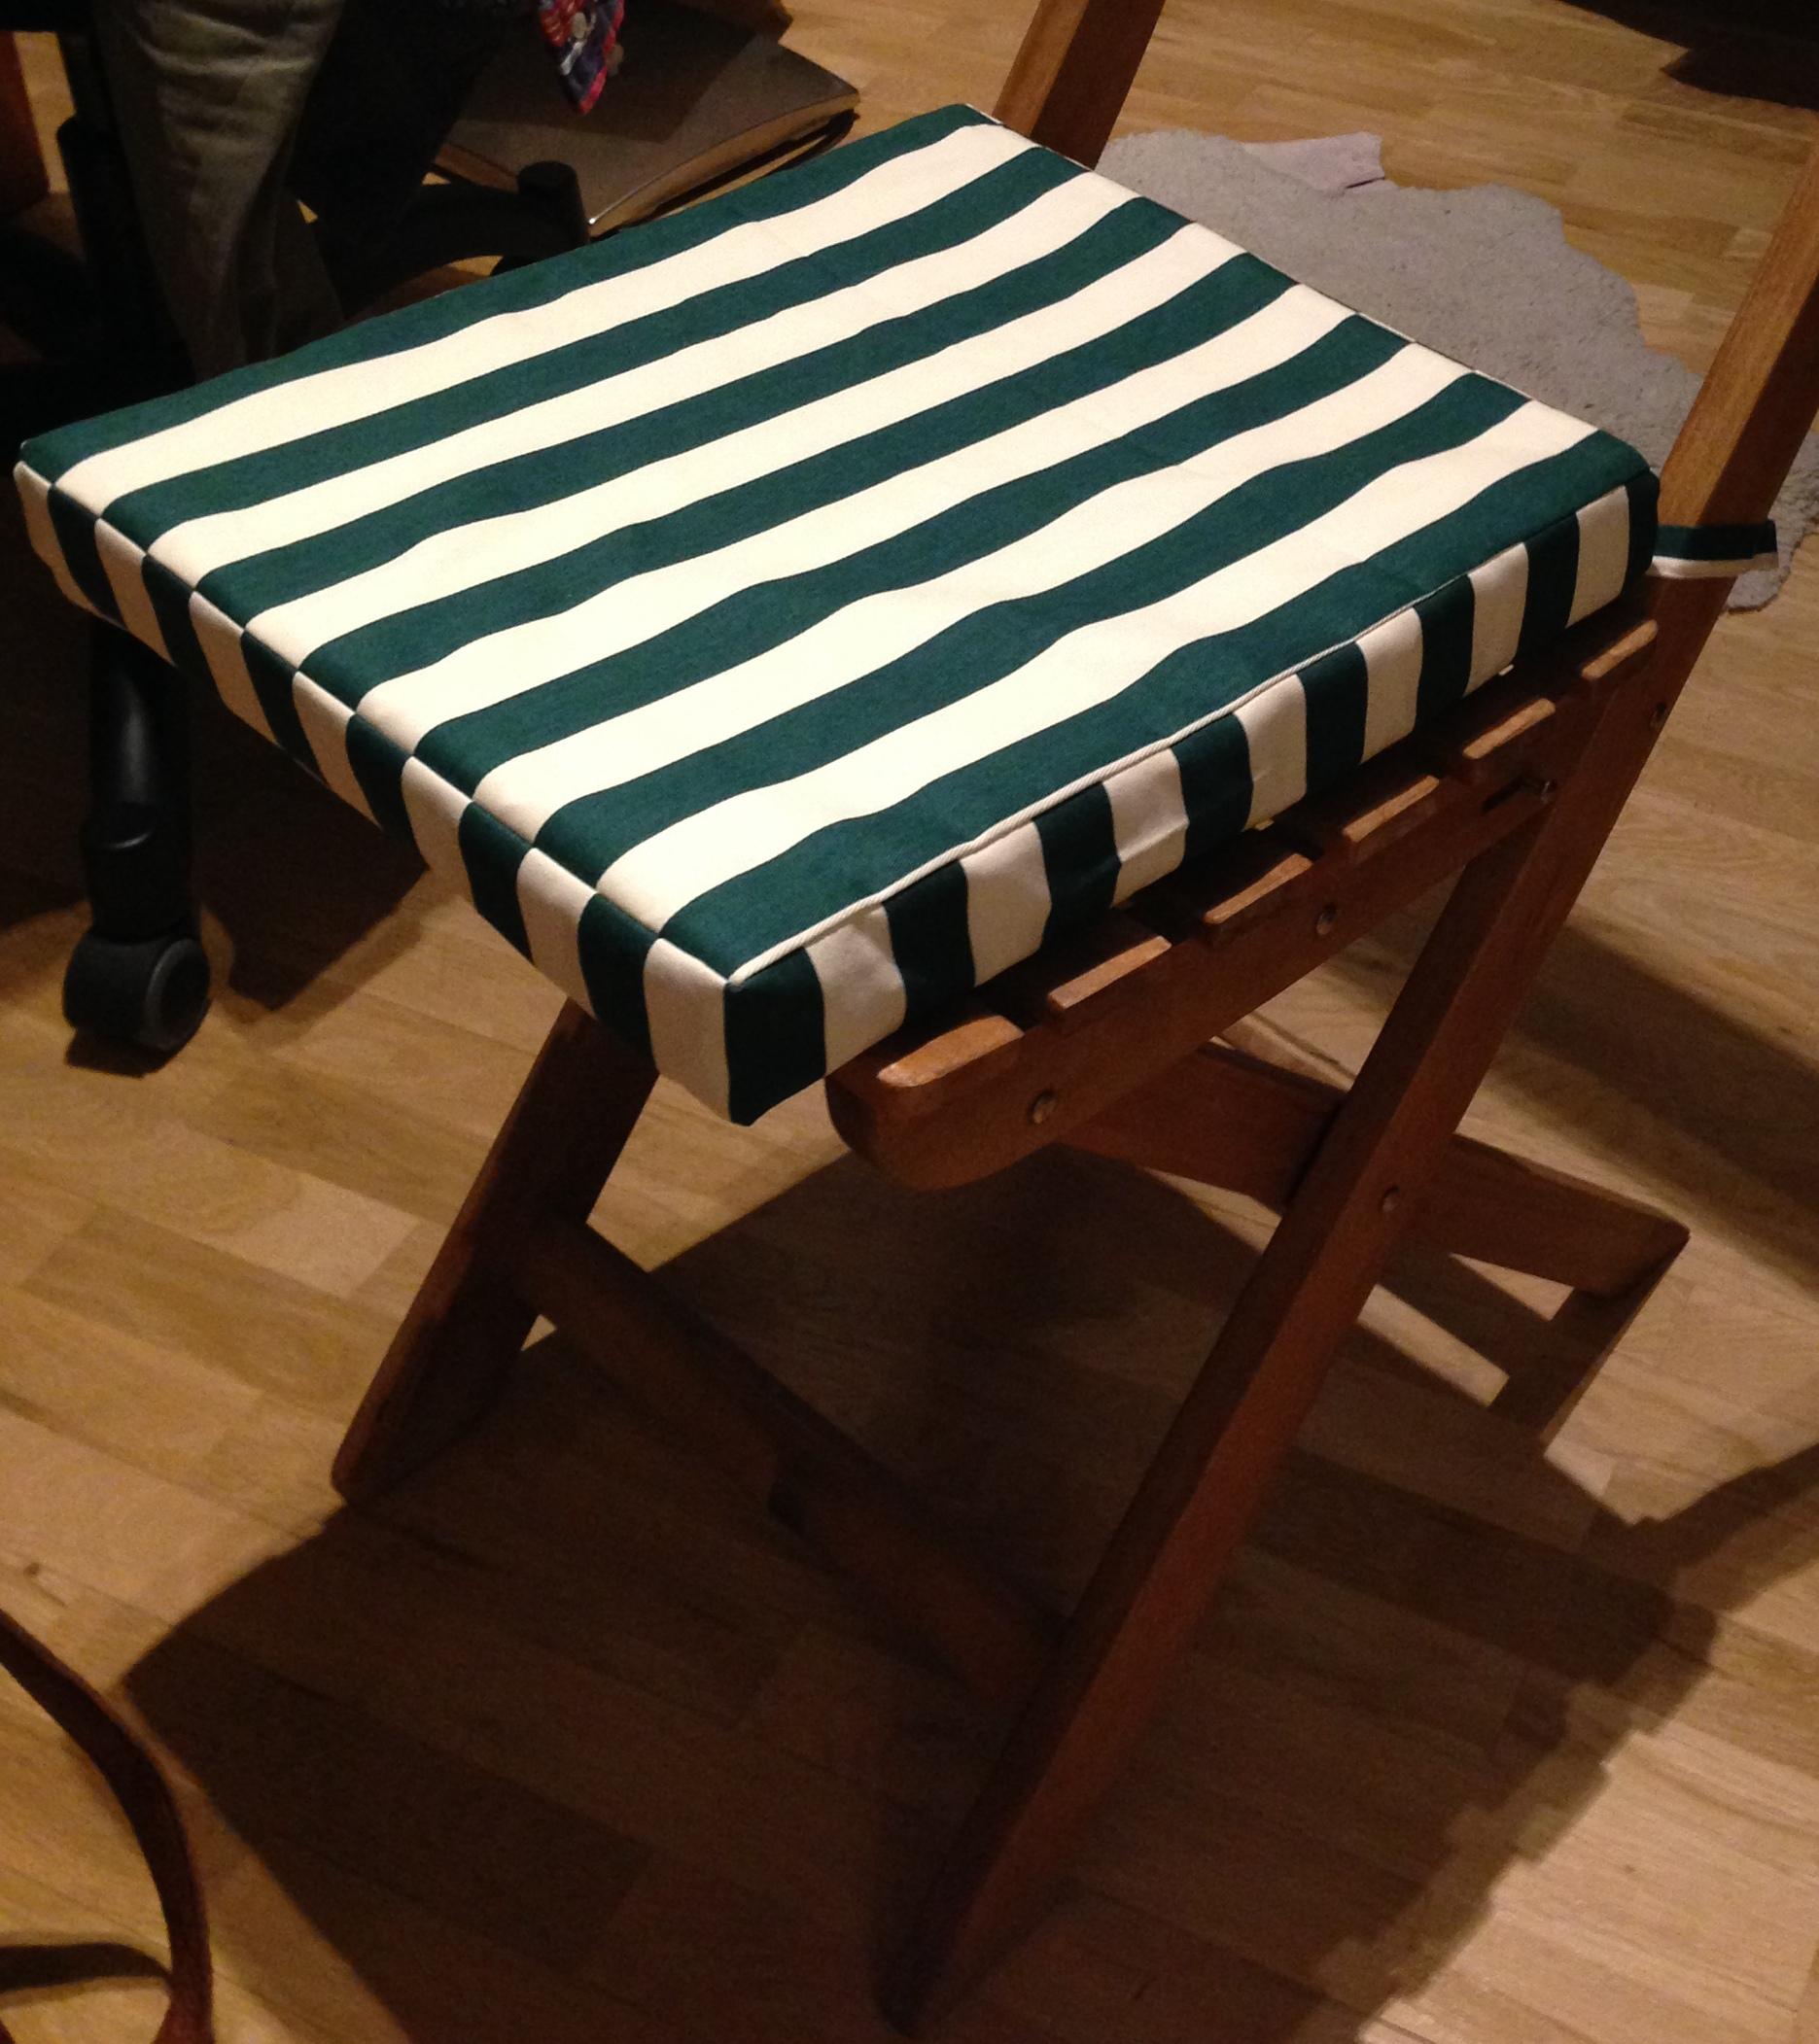 sitzkissen f r gartenst hle bequem den sommer genie en anna n ht. Black Bedroom Furniture Sets. Home Design Ideas